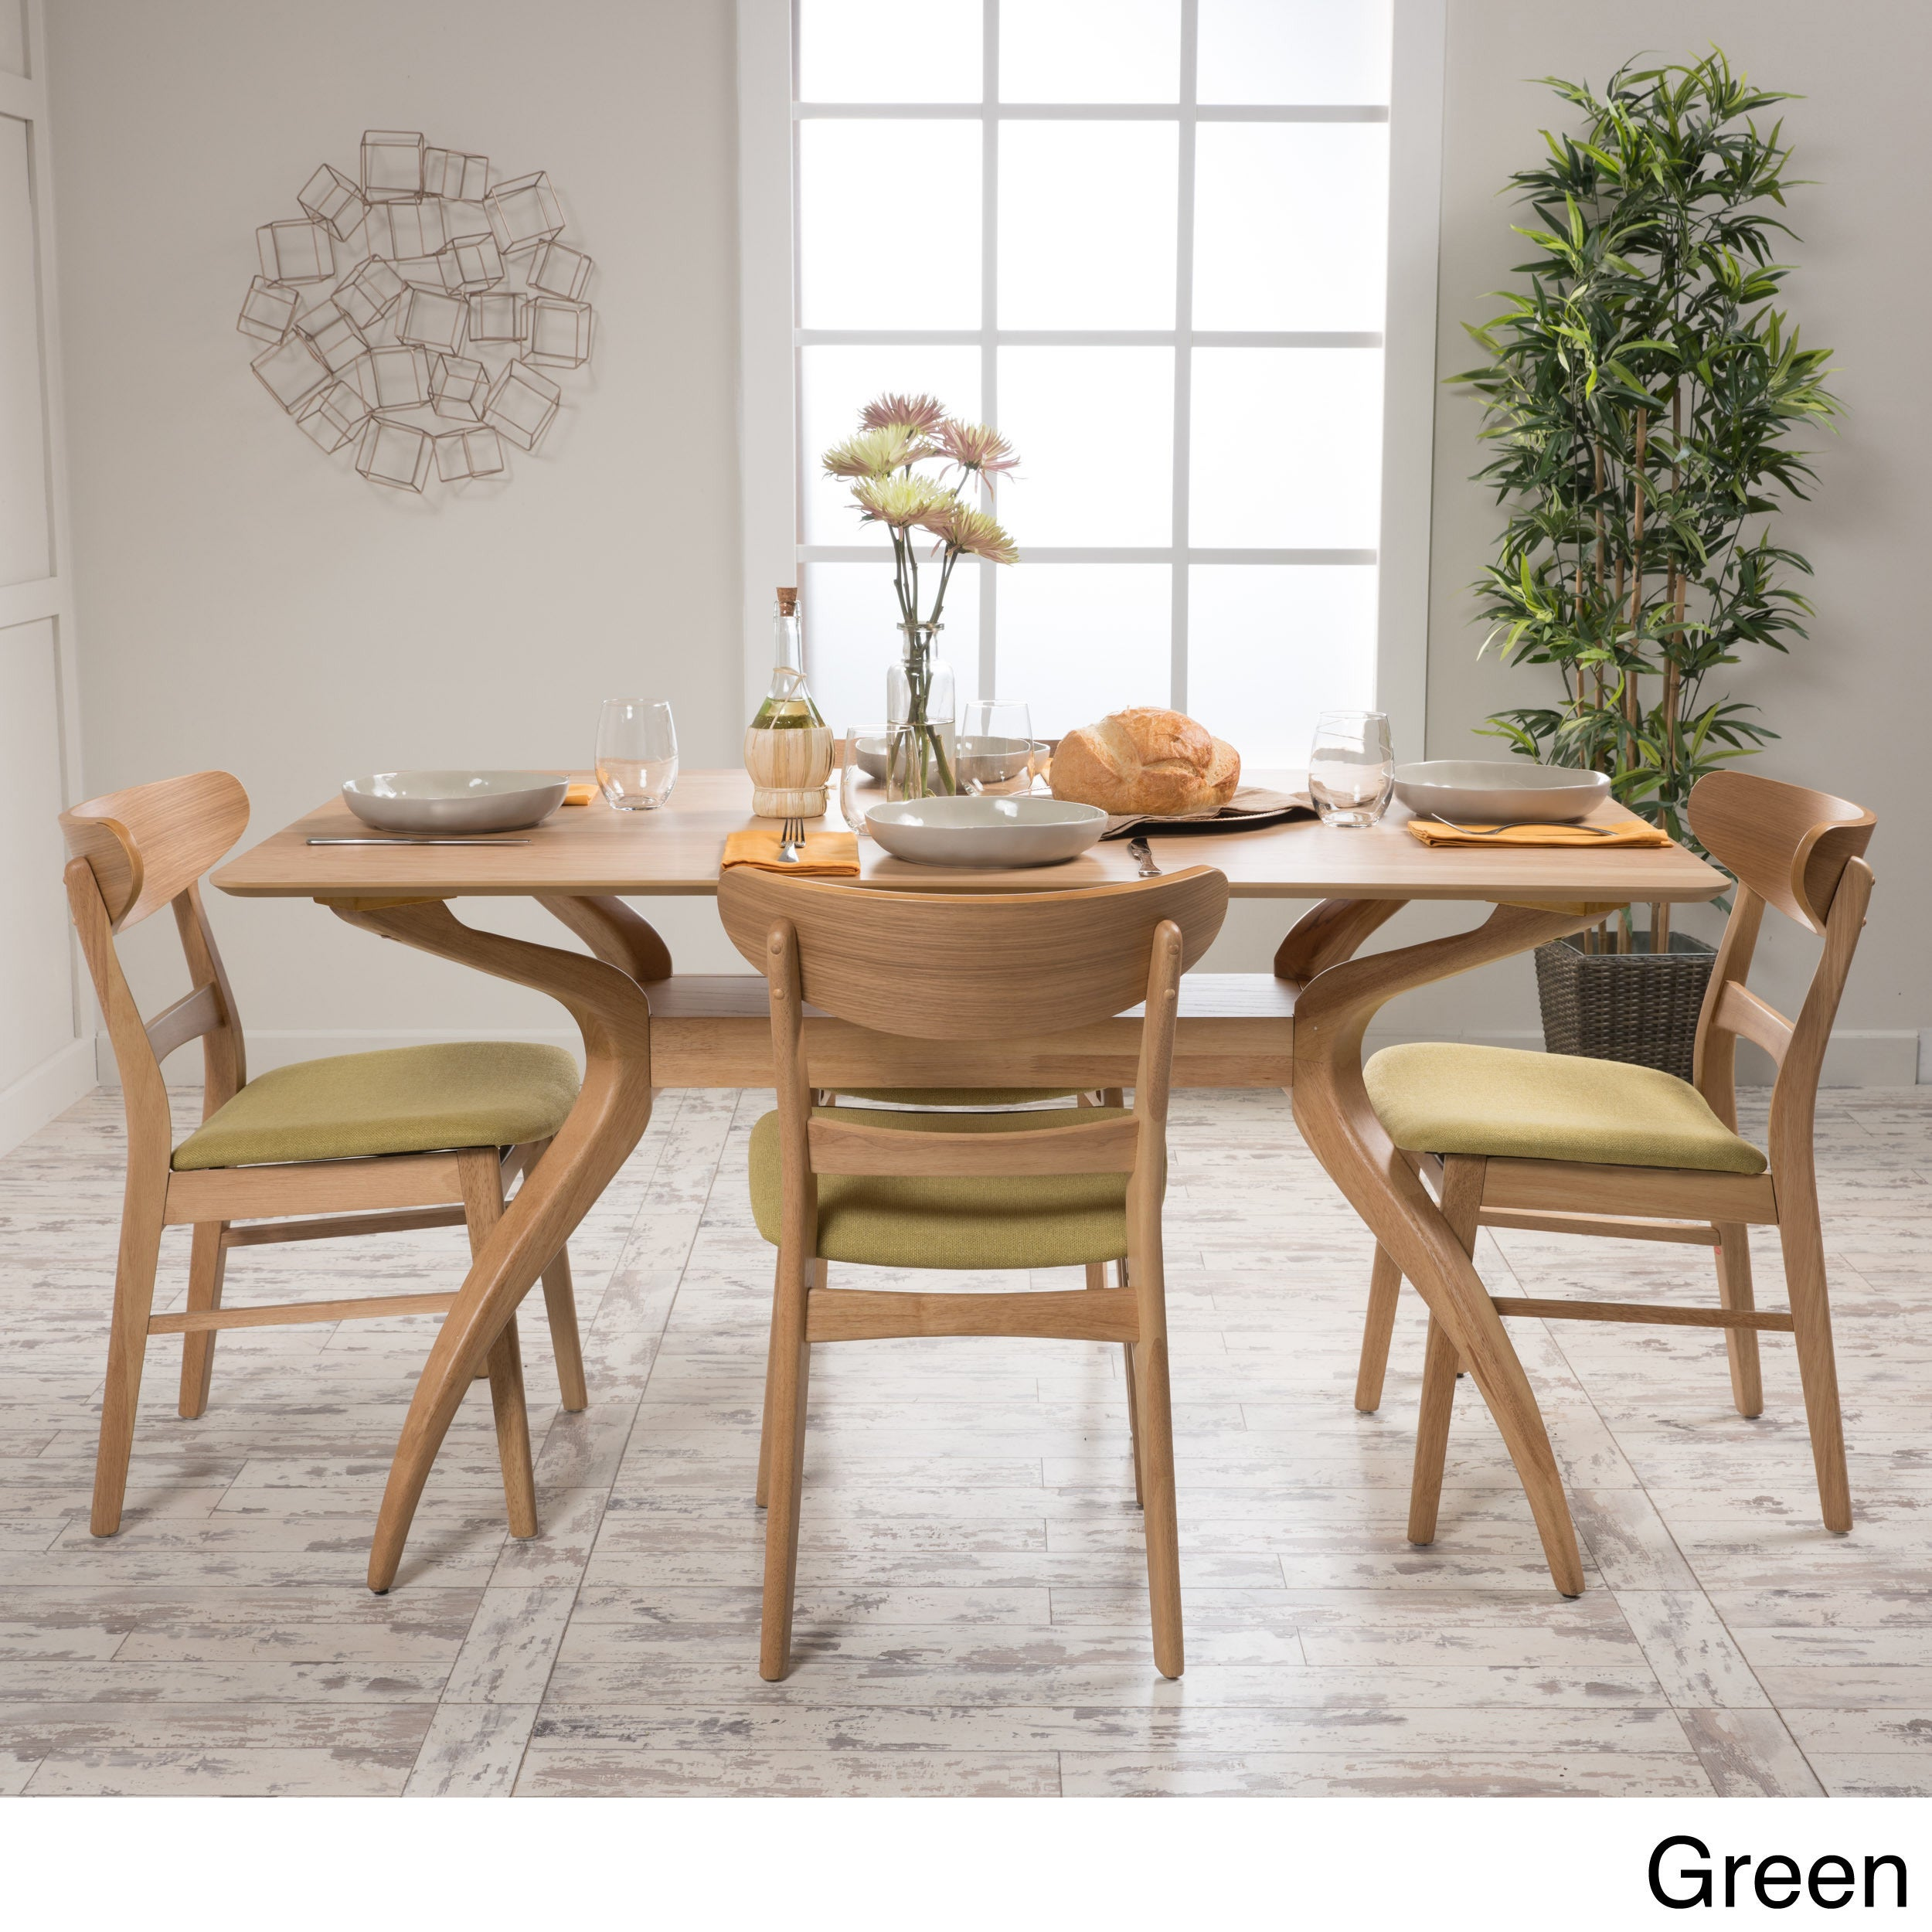 Green Dining Room U0026 Bar Furniture | Find Great Furniture Deals Shopping At  Overstock.com